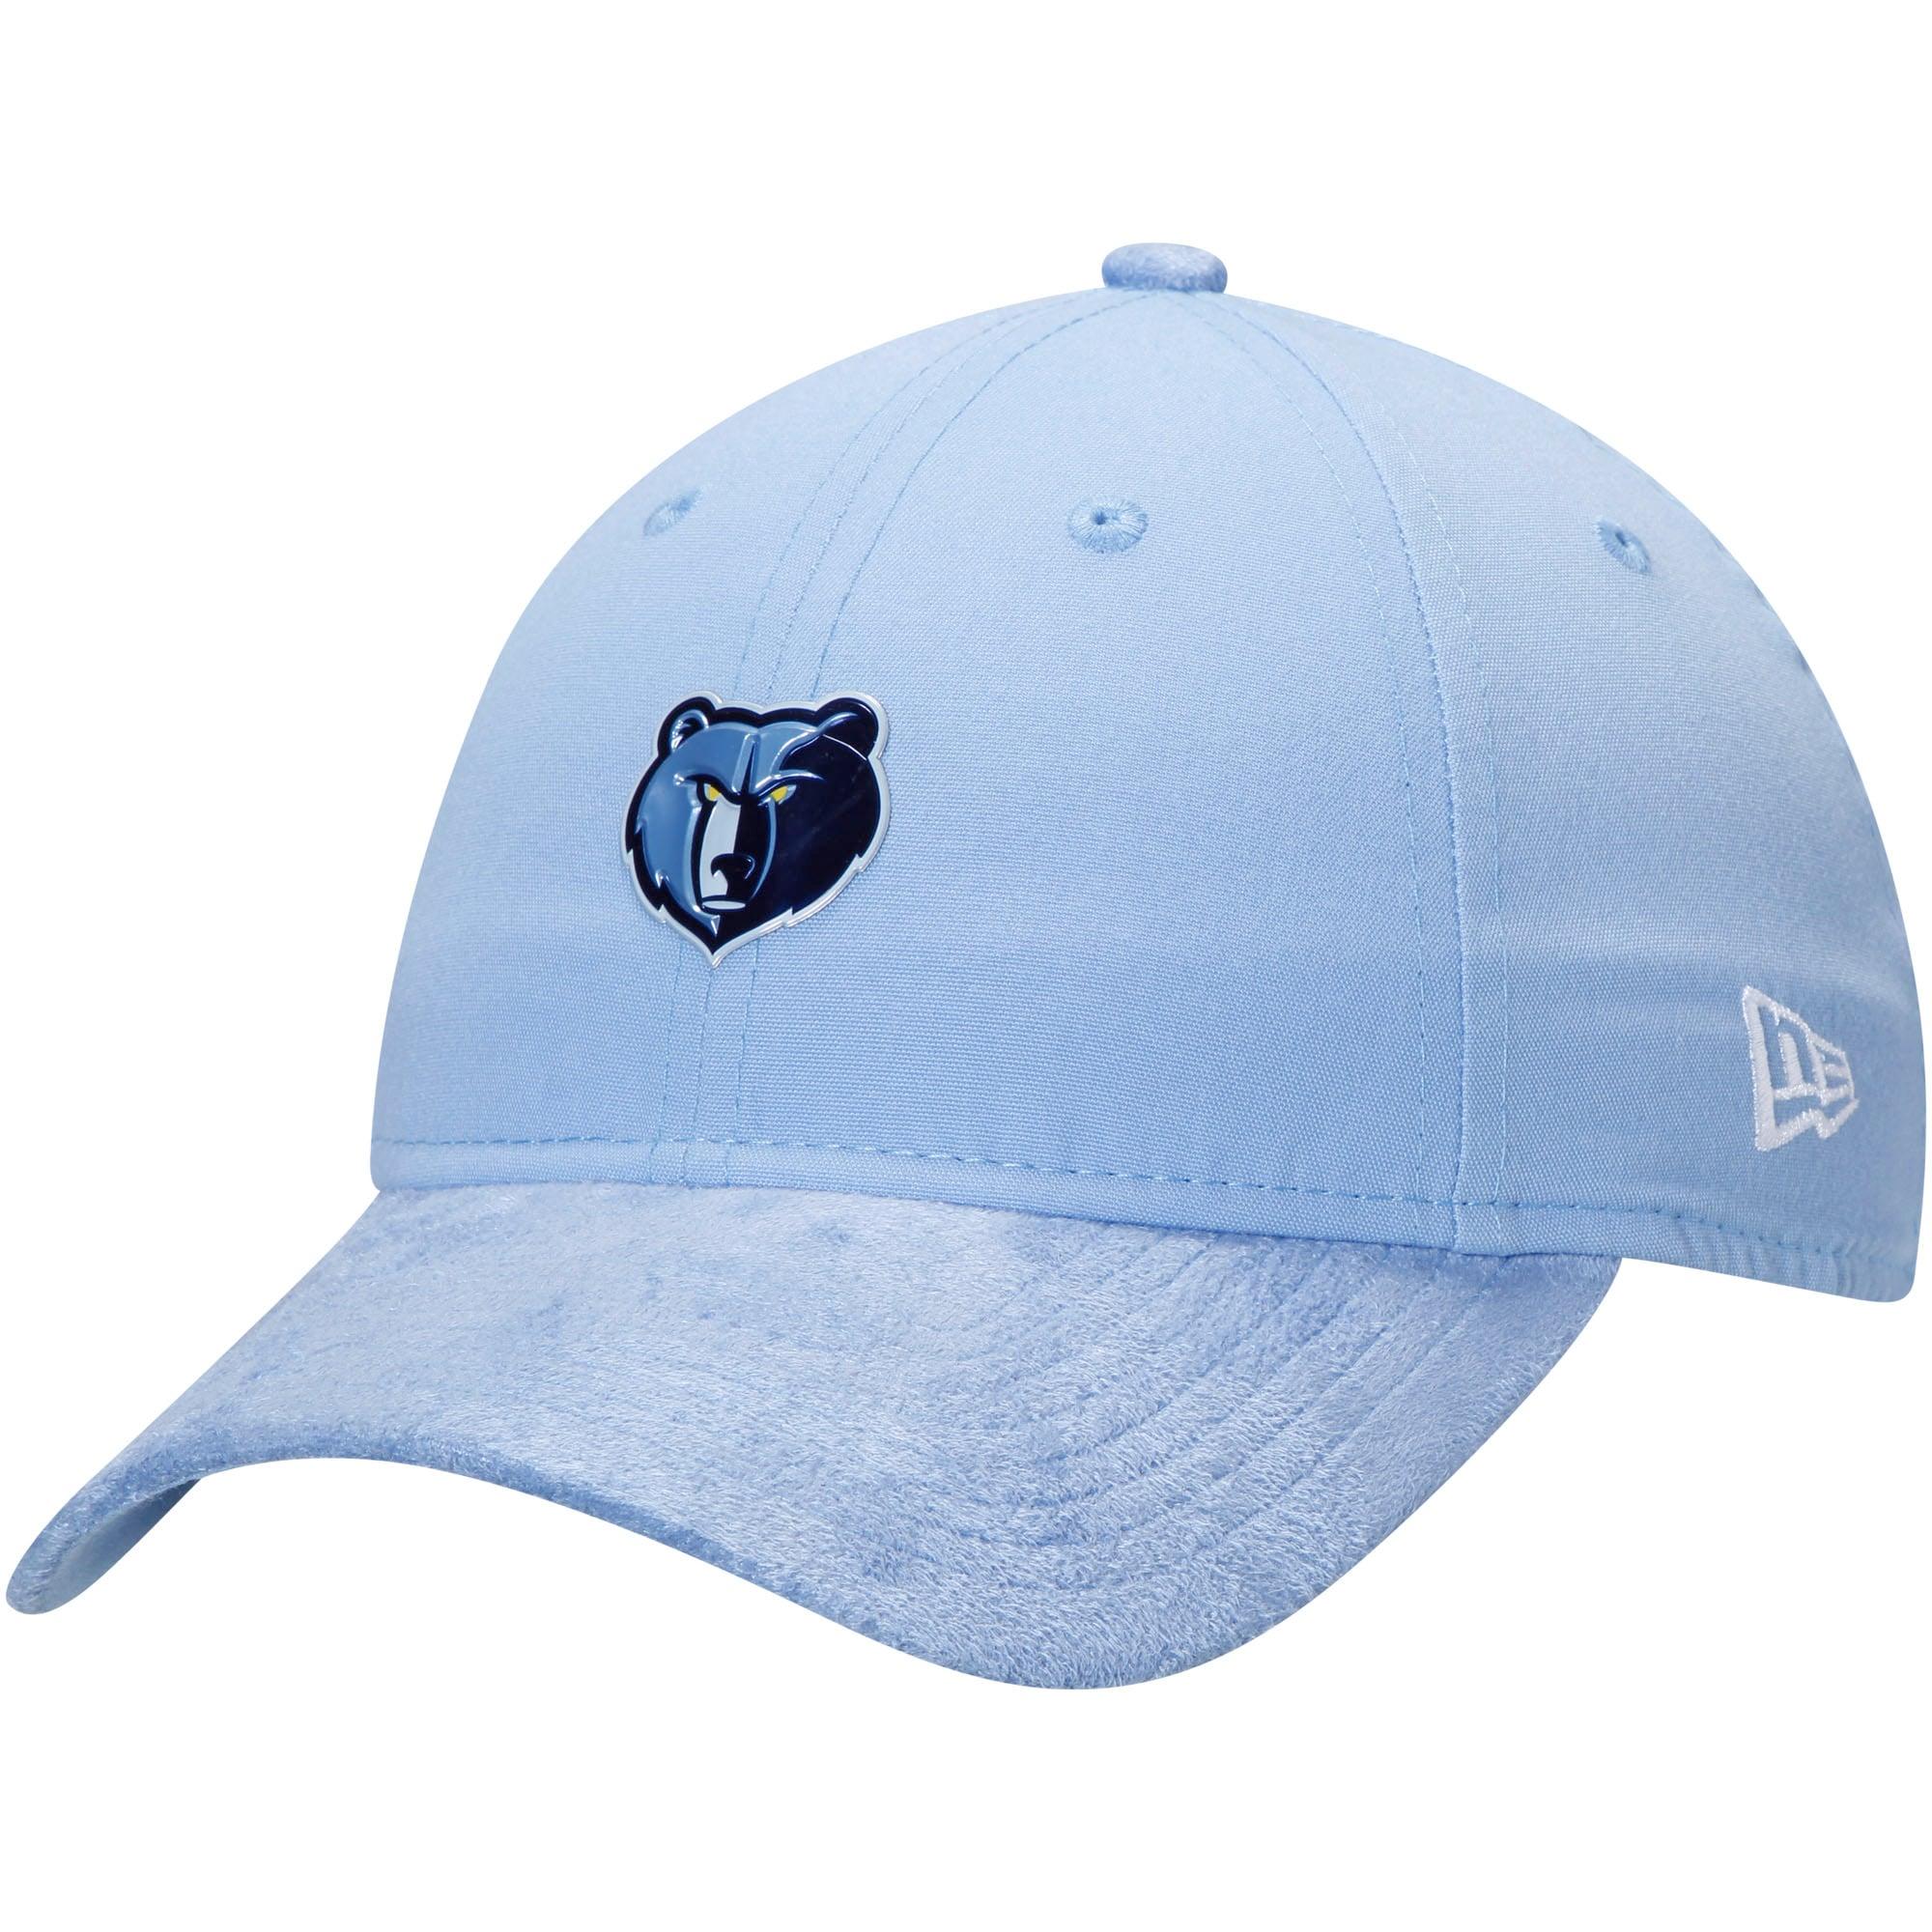 Memphis Grizzlies New Era Official On-Court Collection Draft Series 9TWENTY Adjustable Hat - Light Blue